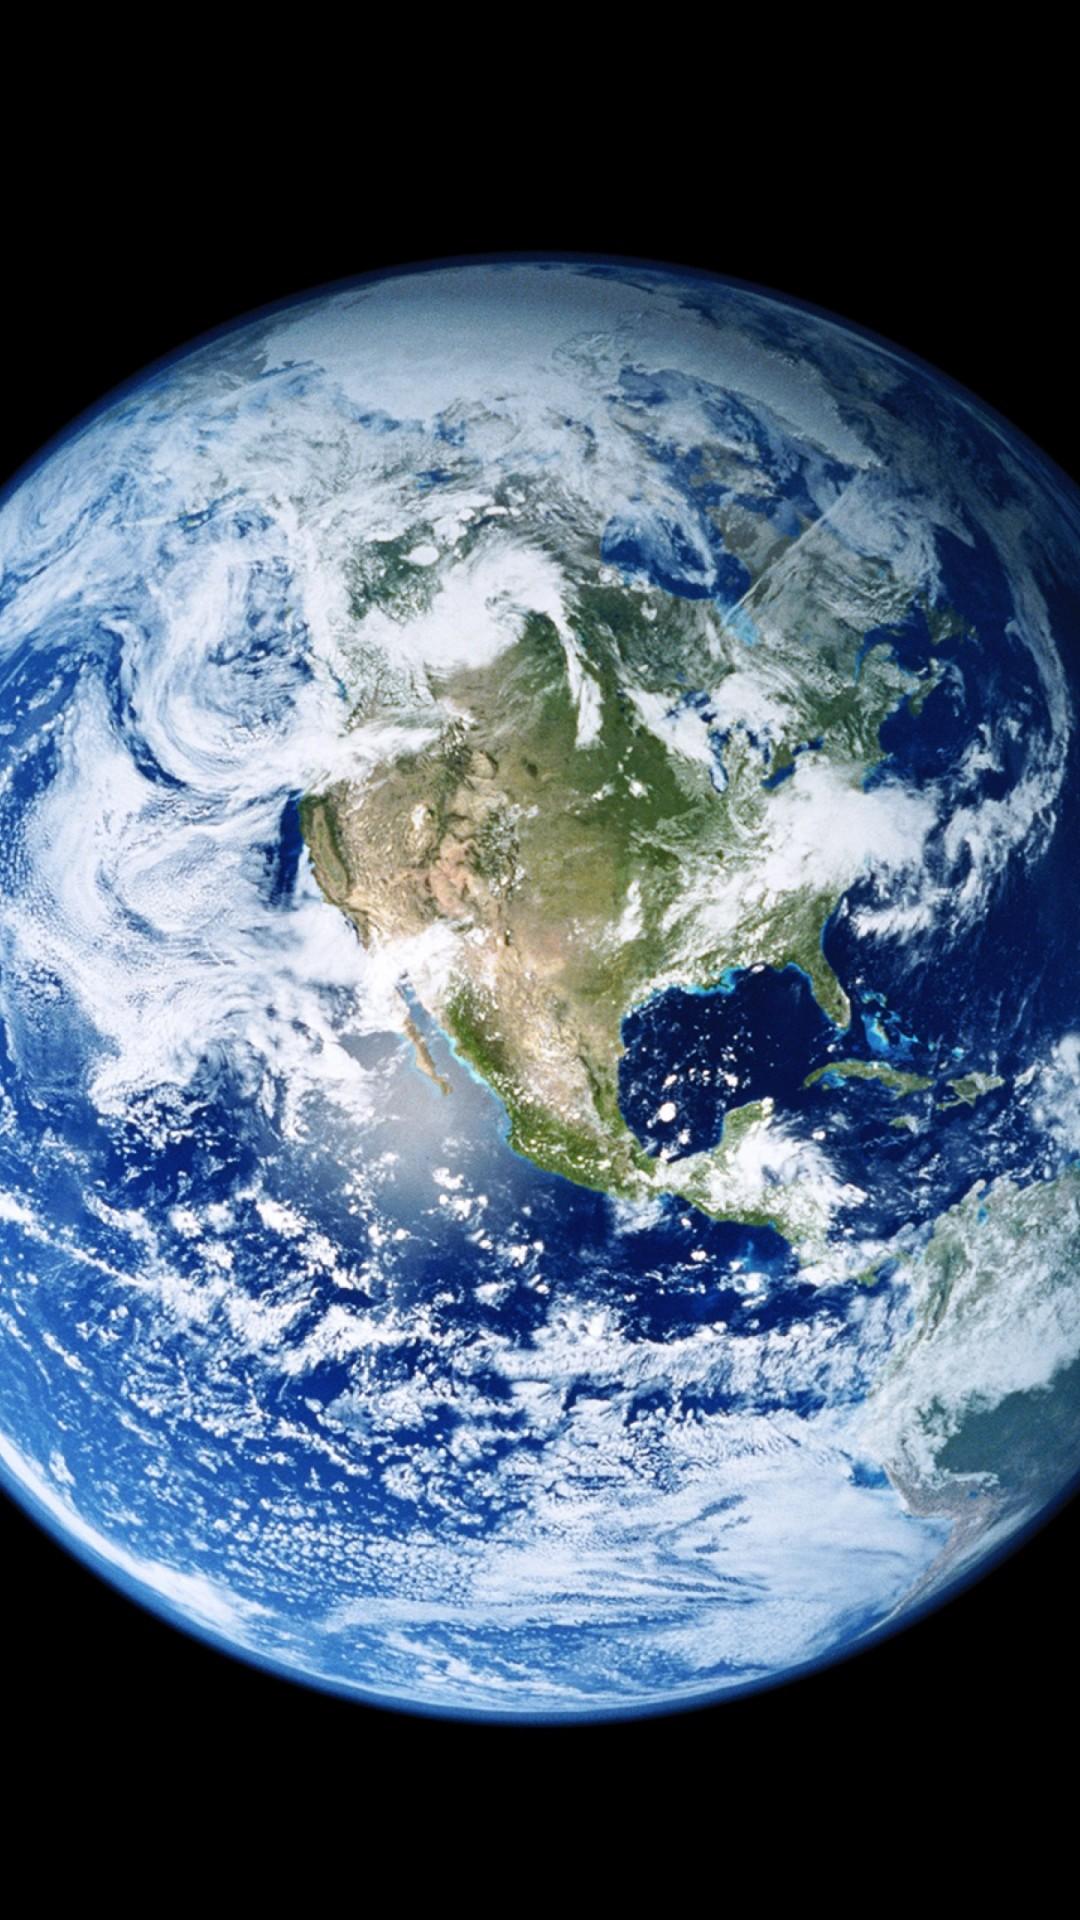 Wallpaper earth planet 4k space 16842 - Space 4k phone wallpaper ...